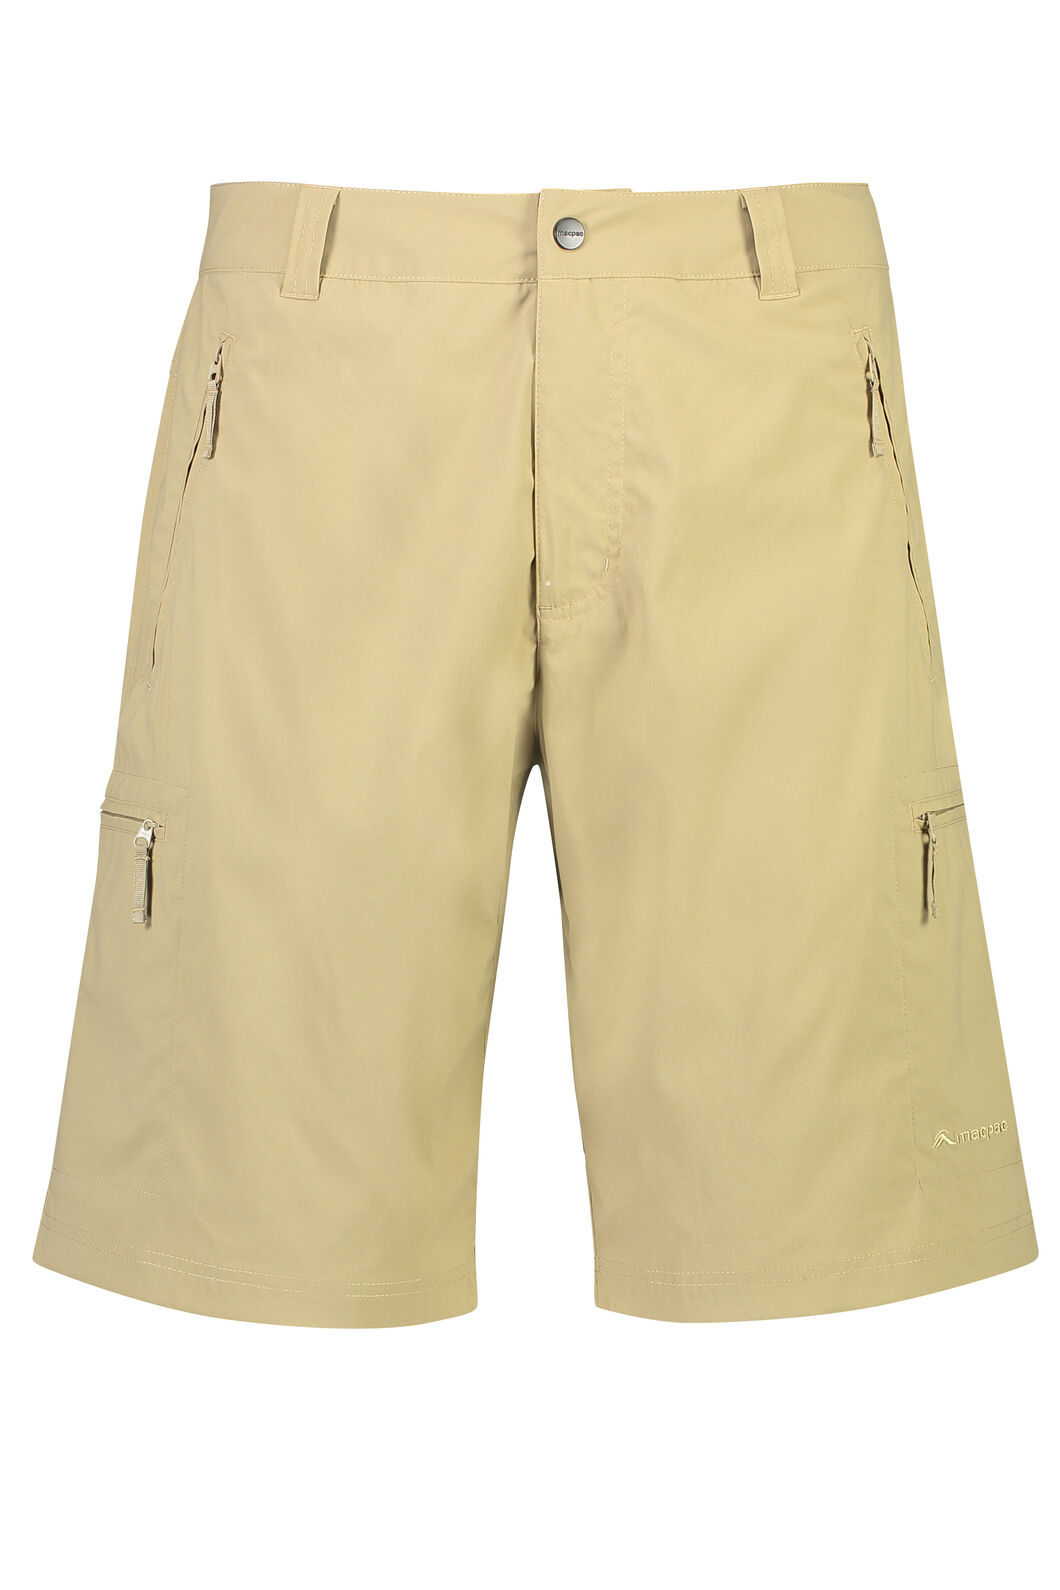 Macpac Drift Shorts - Men's, Lead Grey, hi-res